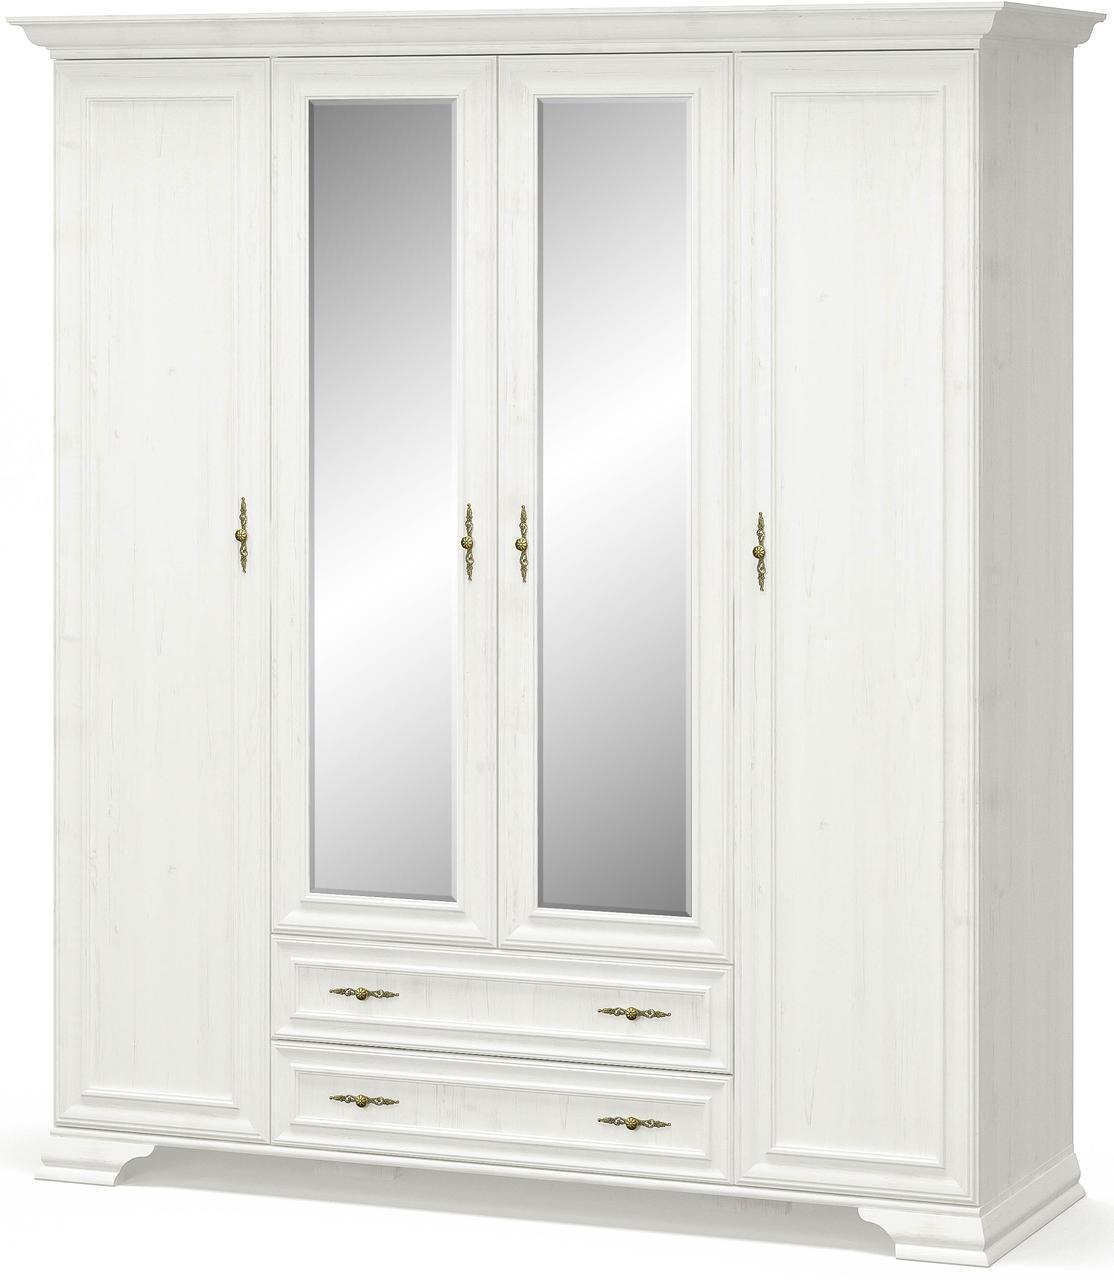 Шкаф 4Д Ирис Андерсон пайн Мебель Сервис (189.6х62.2х212 см)